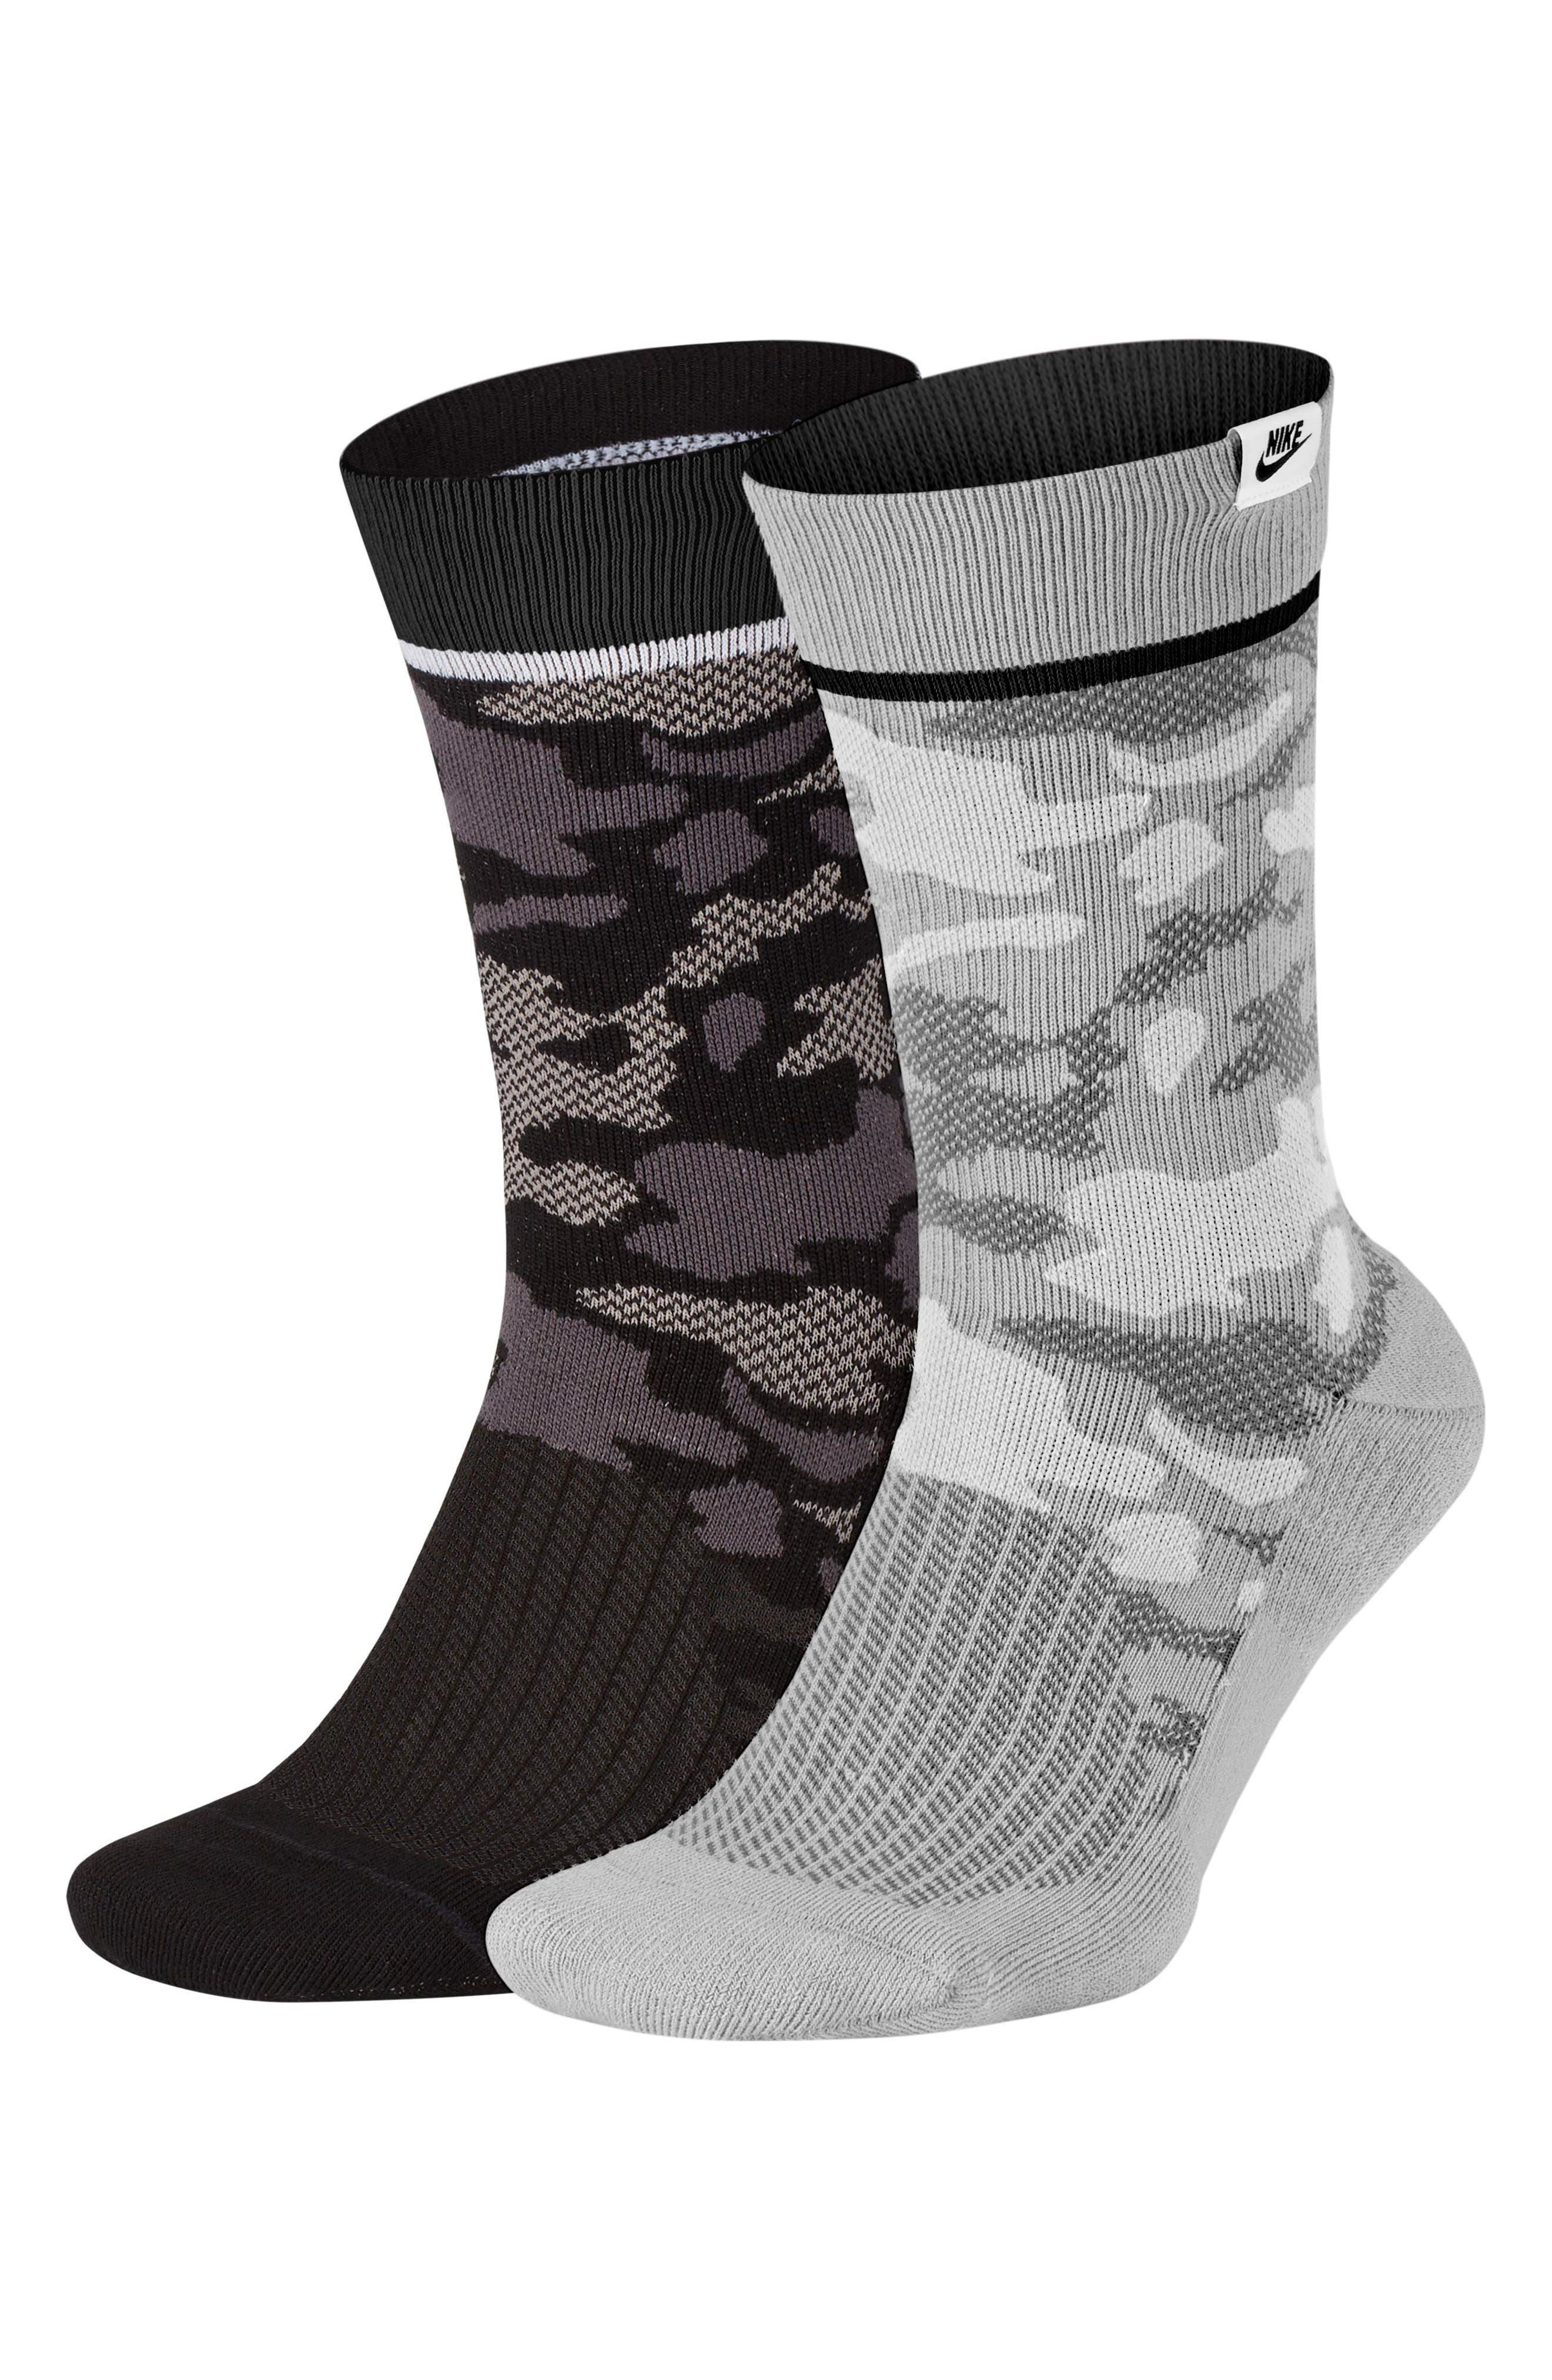 2-Pack Camo Crew Socks, Main, color, BLACK/ WHITE/ GREY